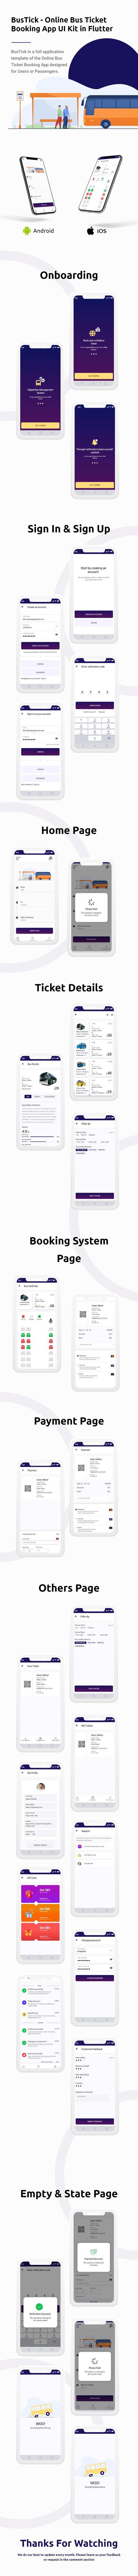 BusTick - Online Bus Ticket Booking App UI Kit in Flutter - 2